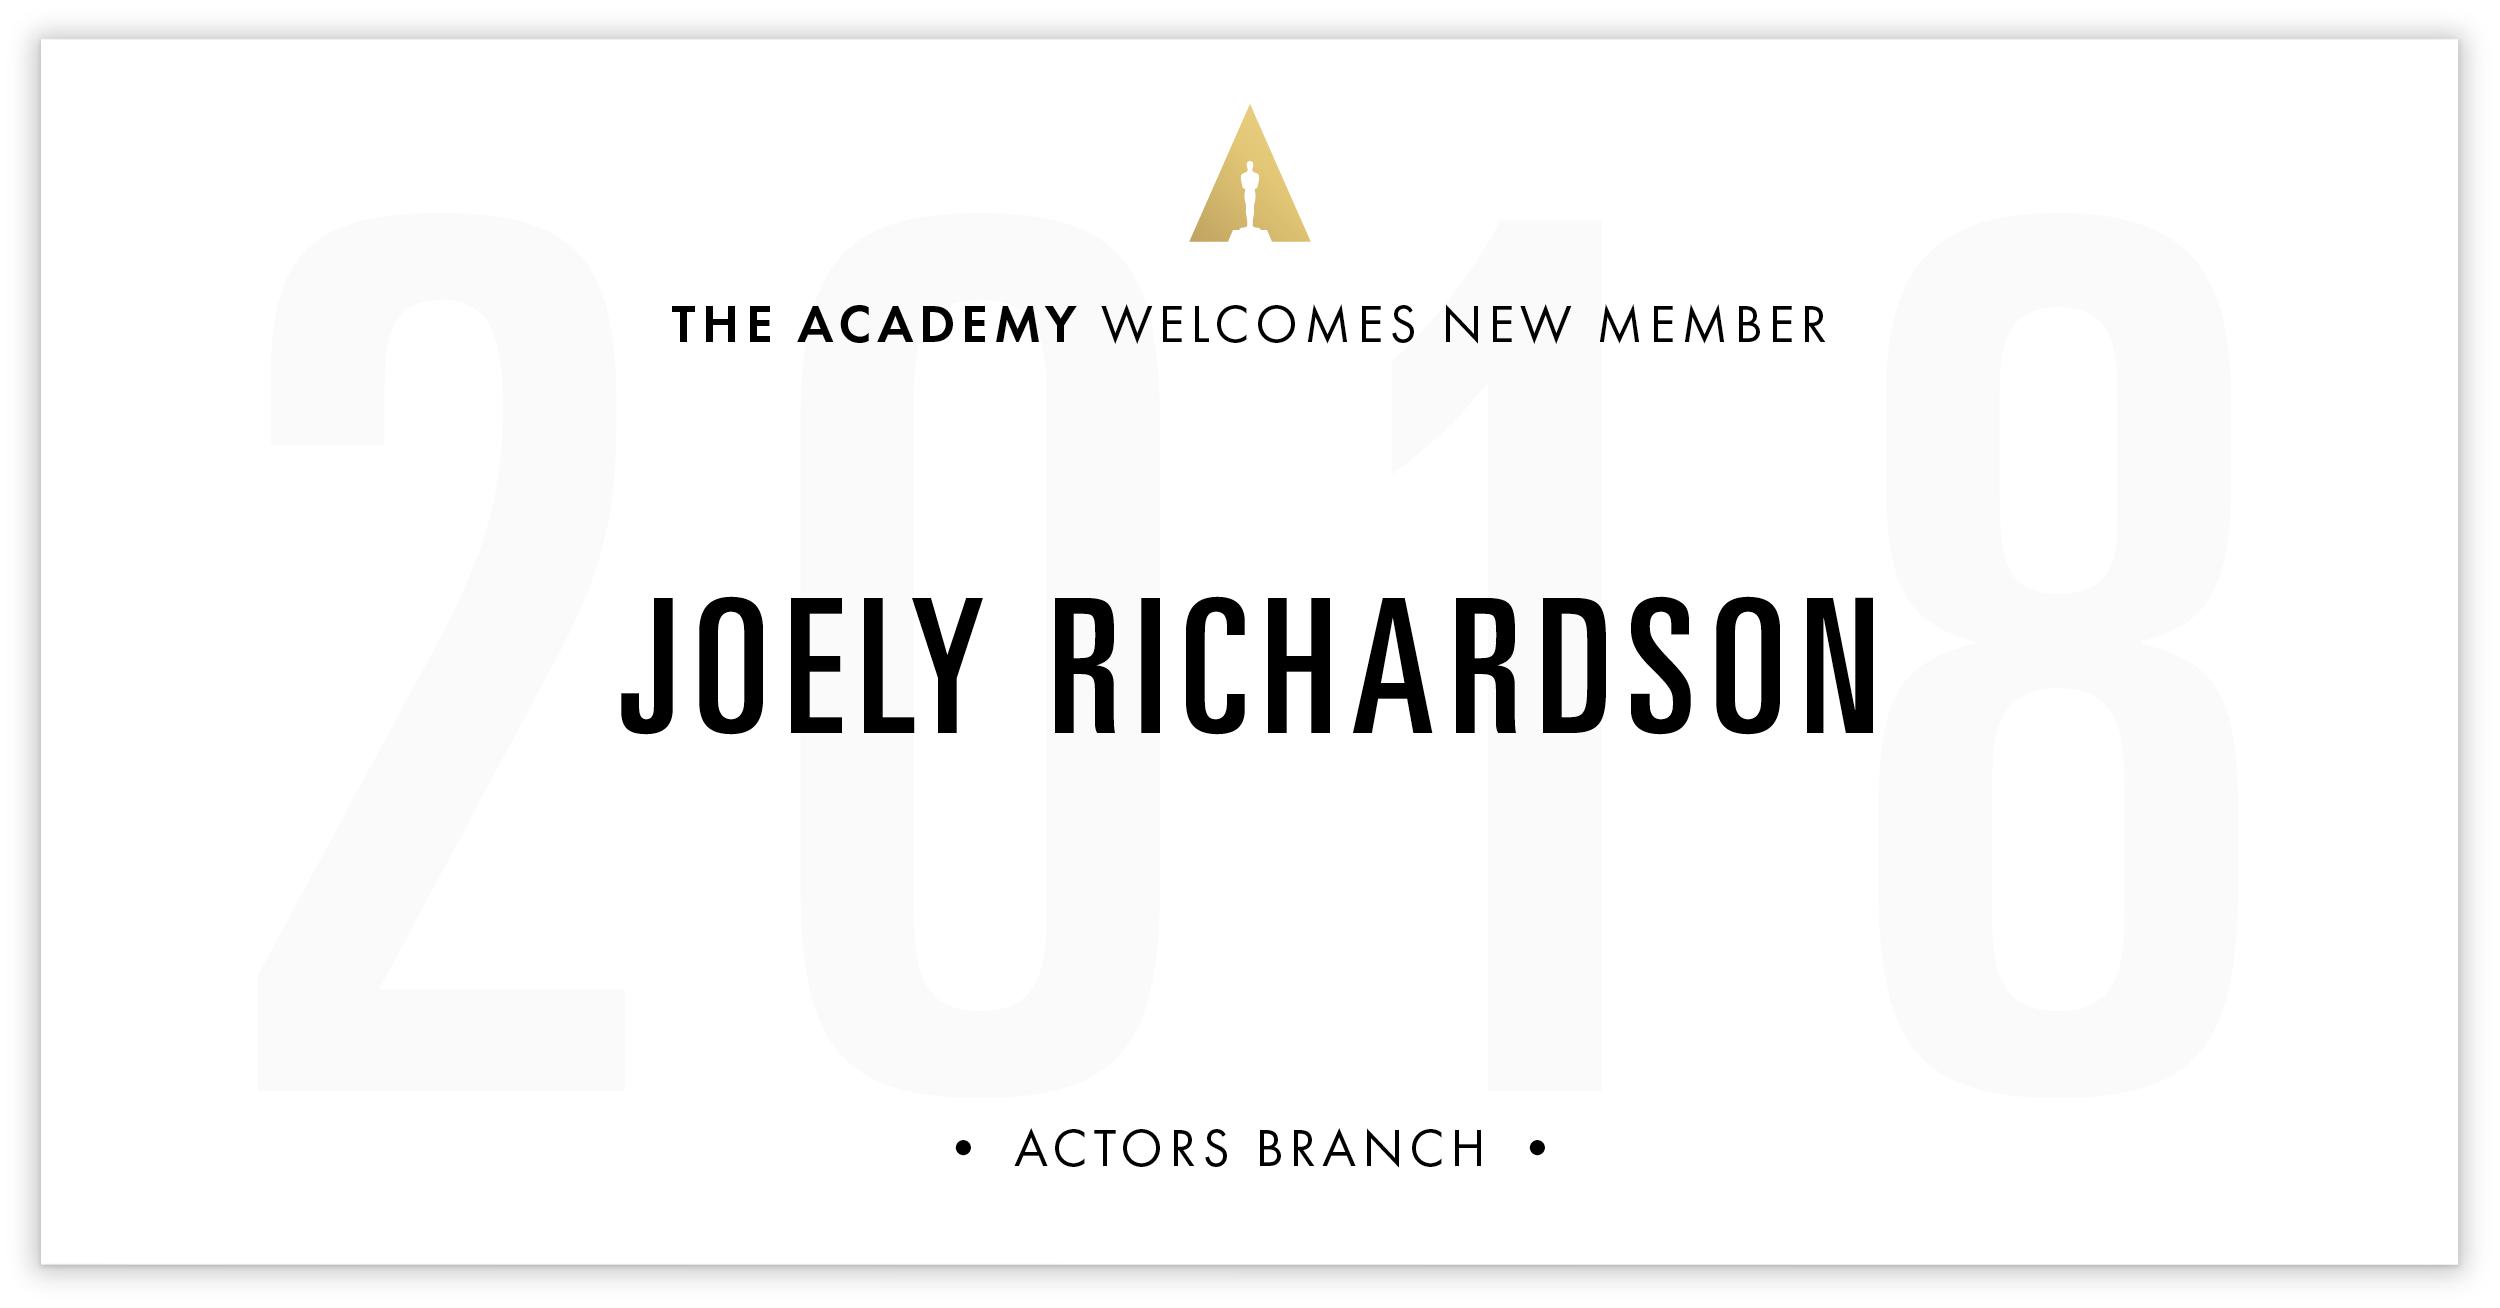 Joely Richardson is invited!